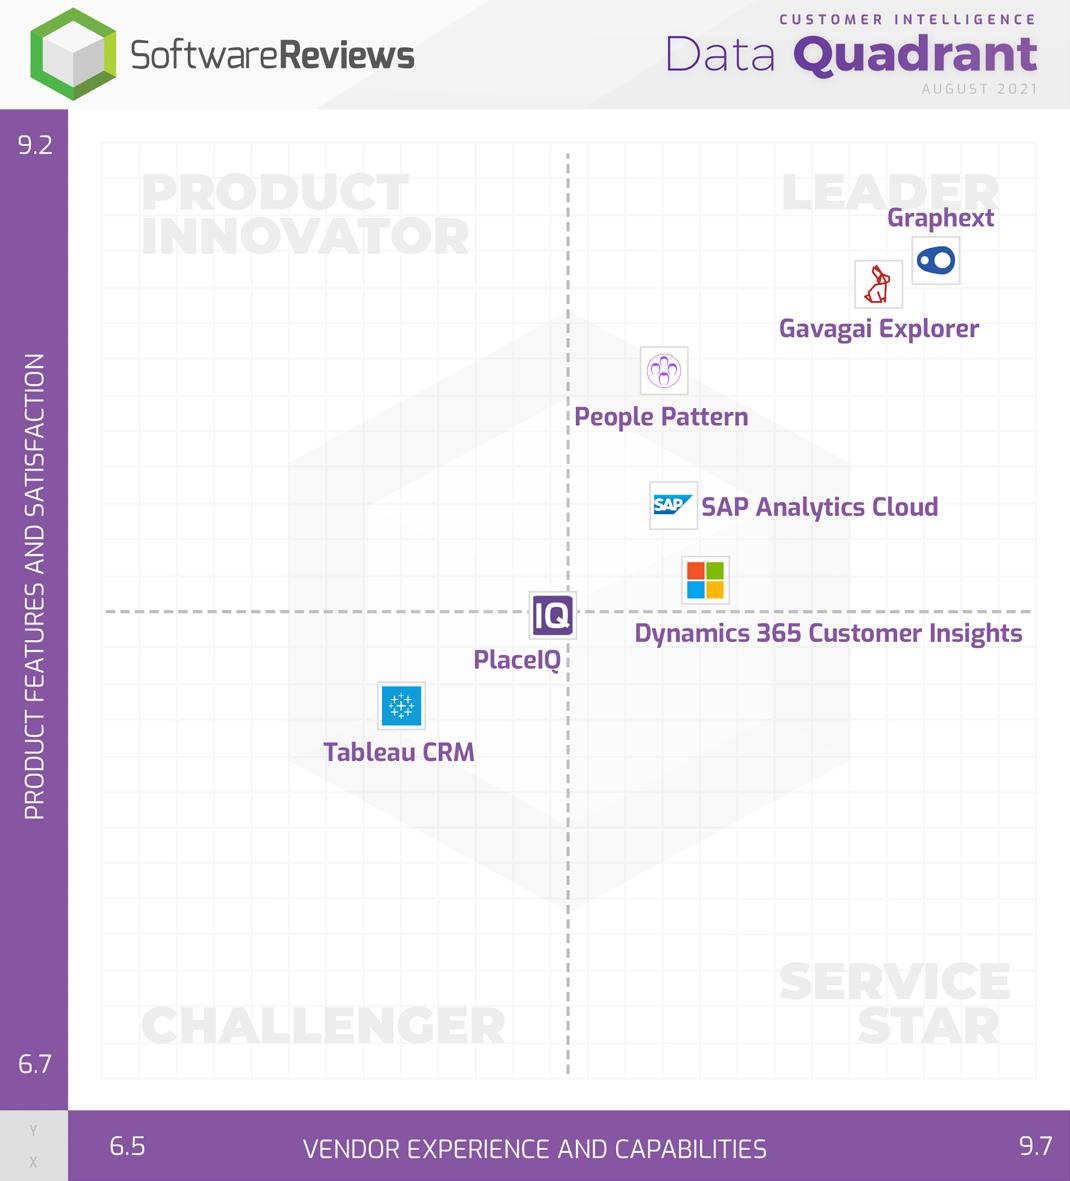 Customer Intelligence Data Quadrant